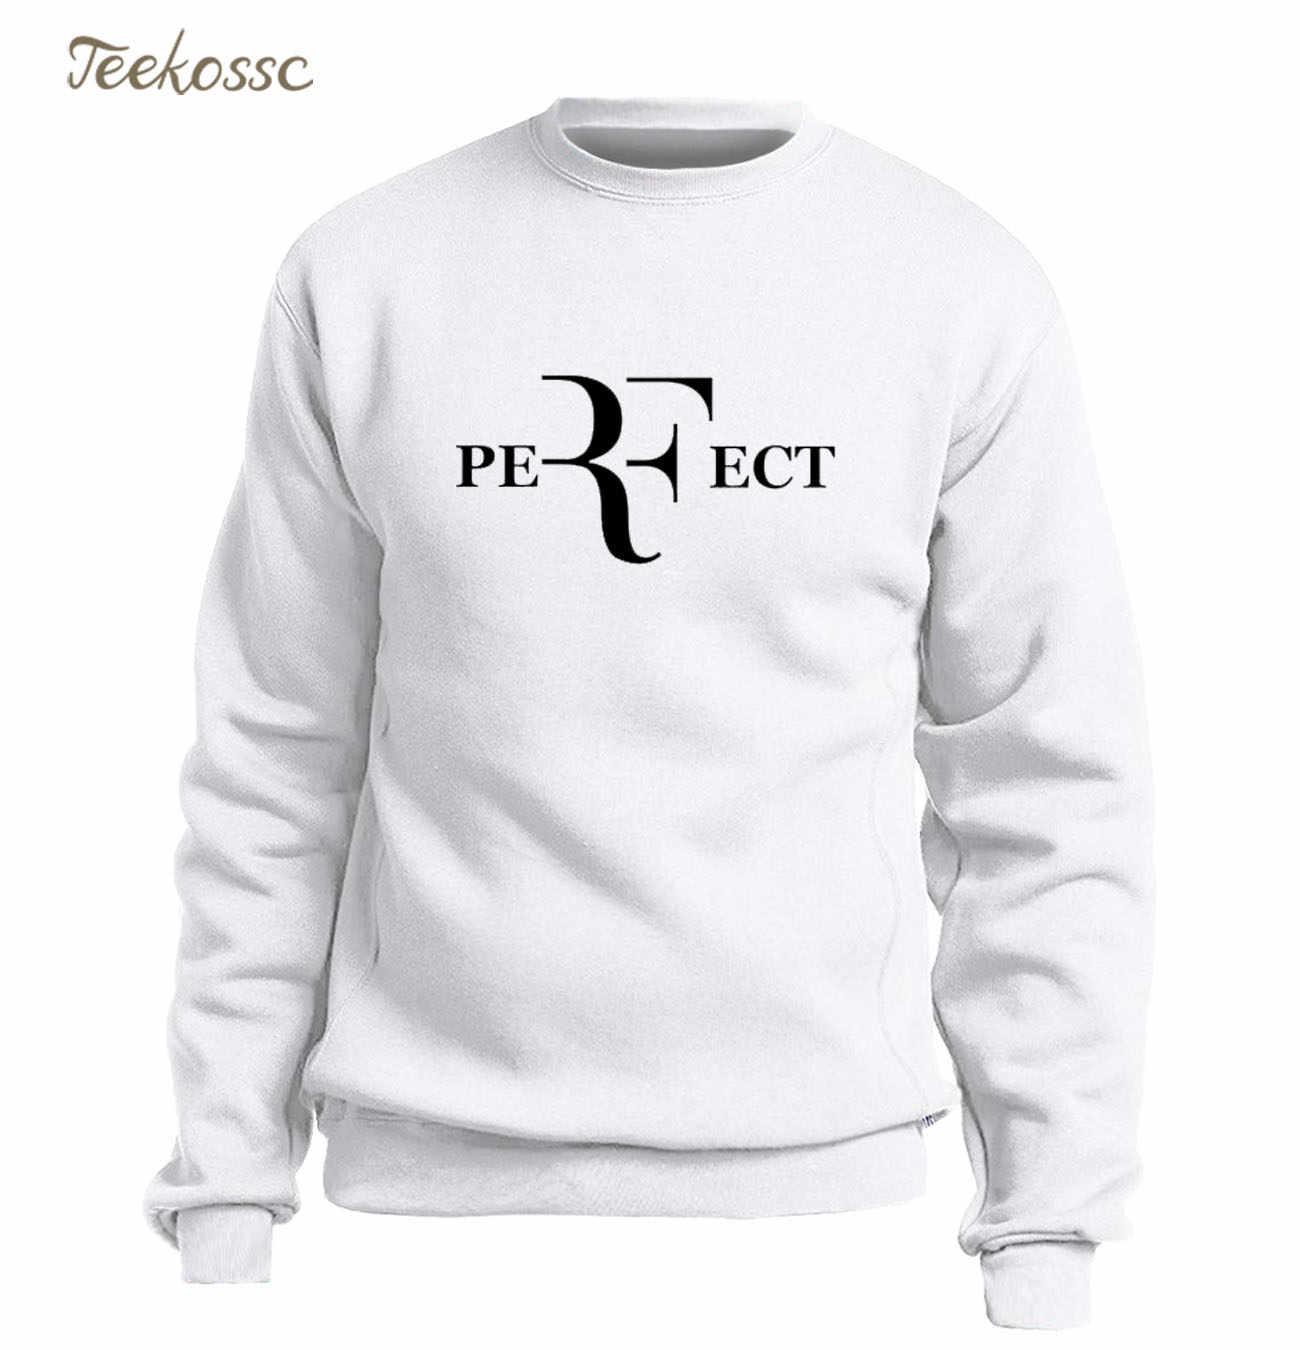 5383a68f ... Roger Federer Tennis Hoodie Men RF Perfect Letters Sweatshirt Balck  Gray Sweatshirts 2018 Winter Autumn Fleece ...